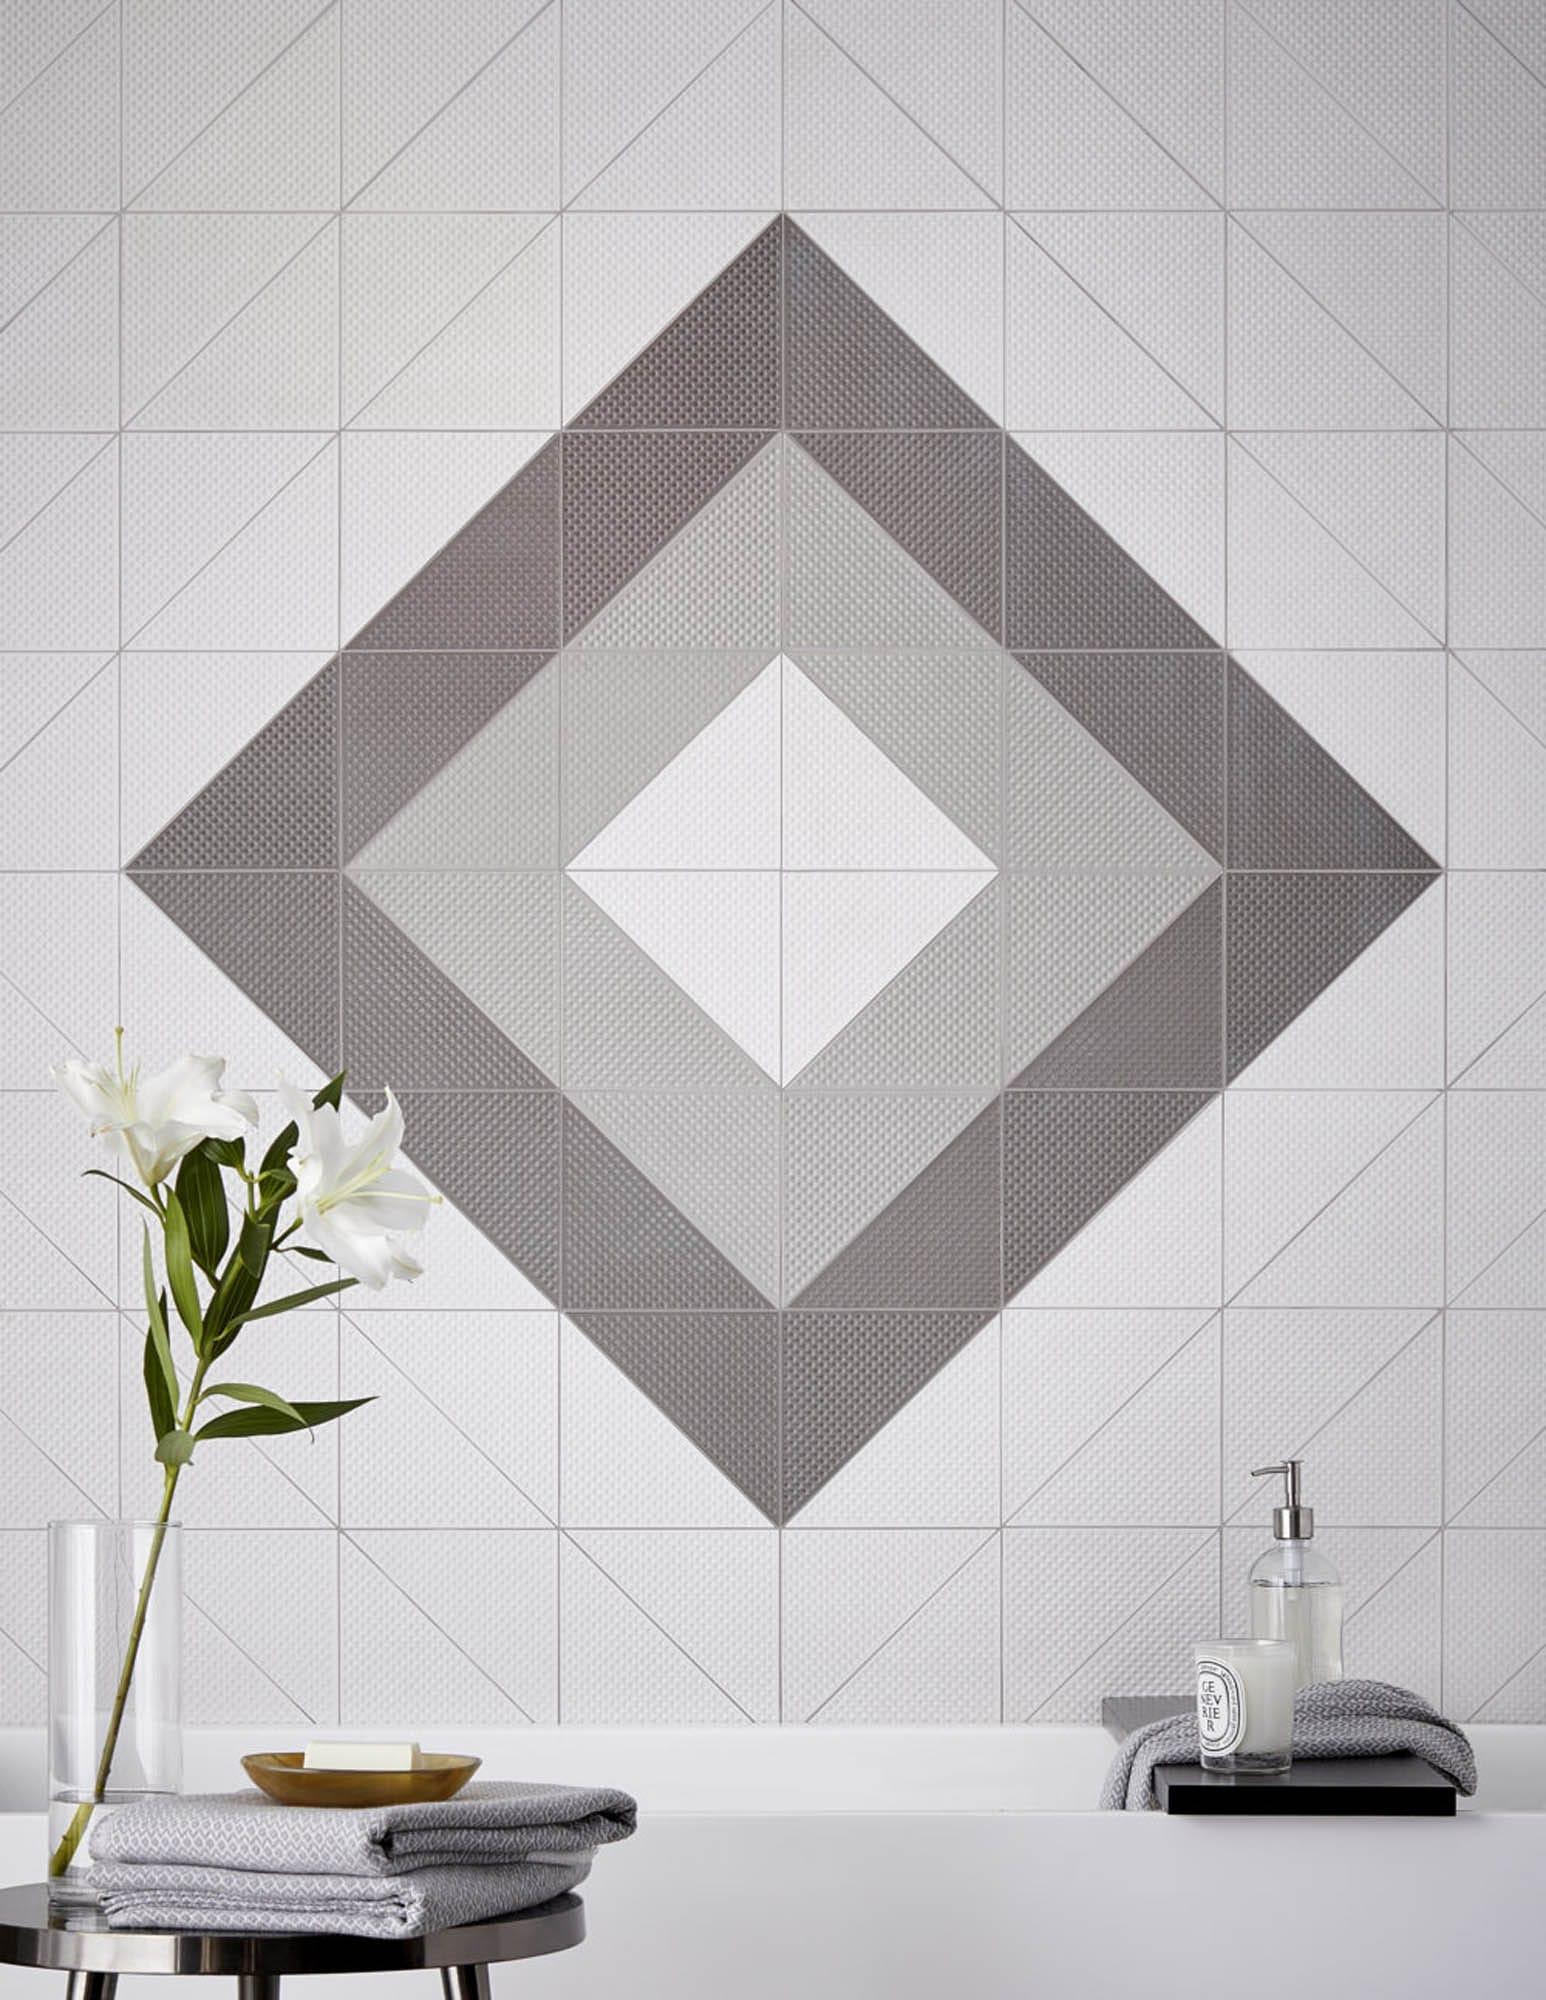 Diamond design with tile